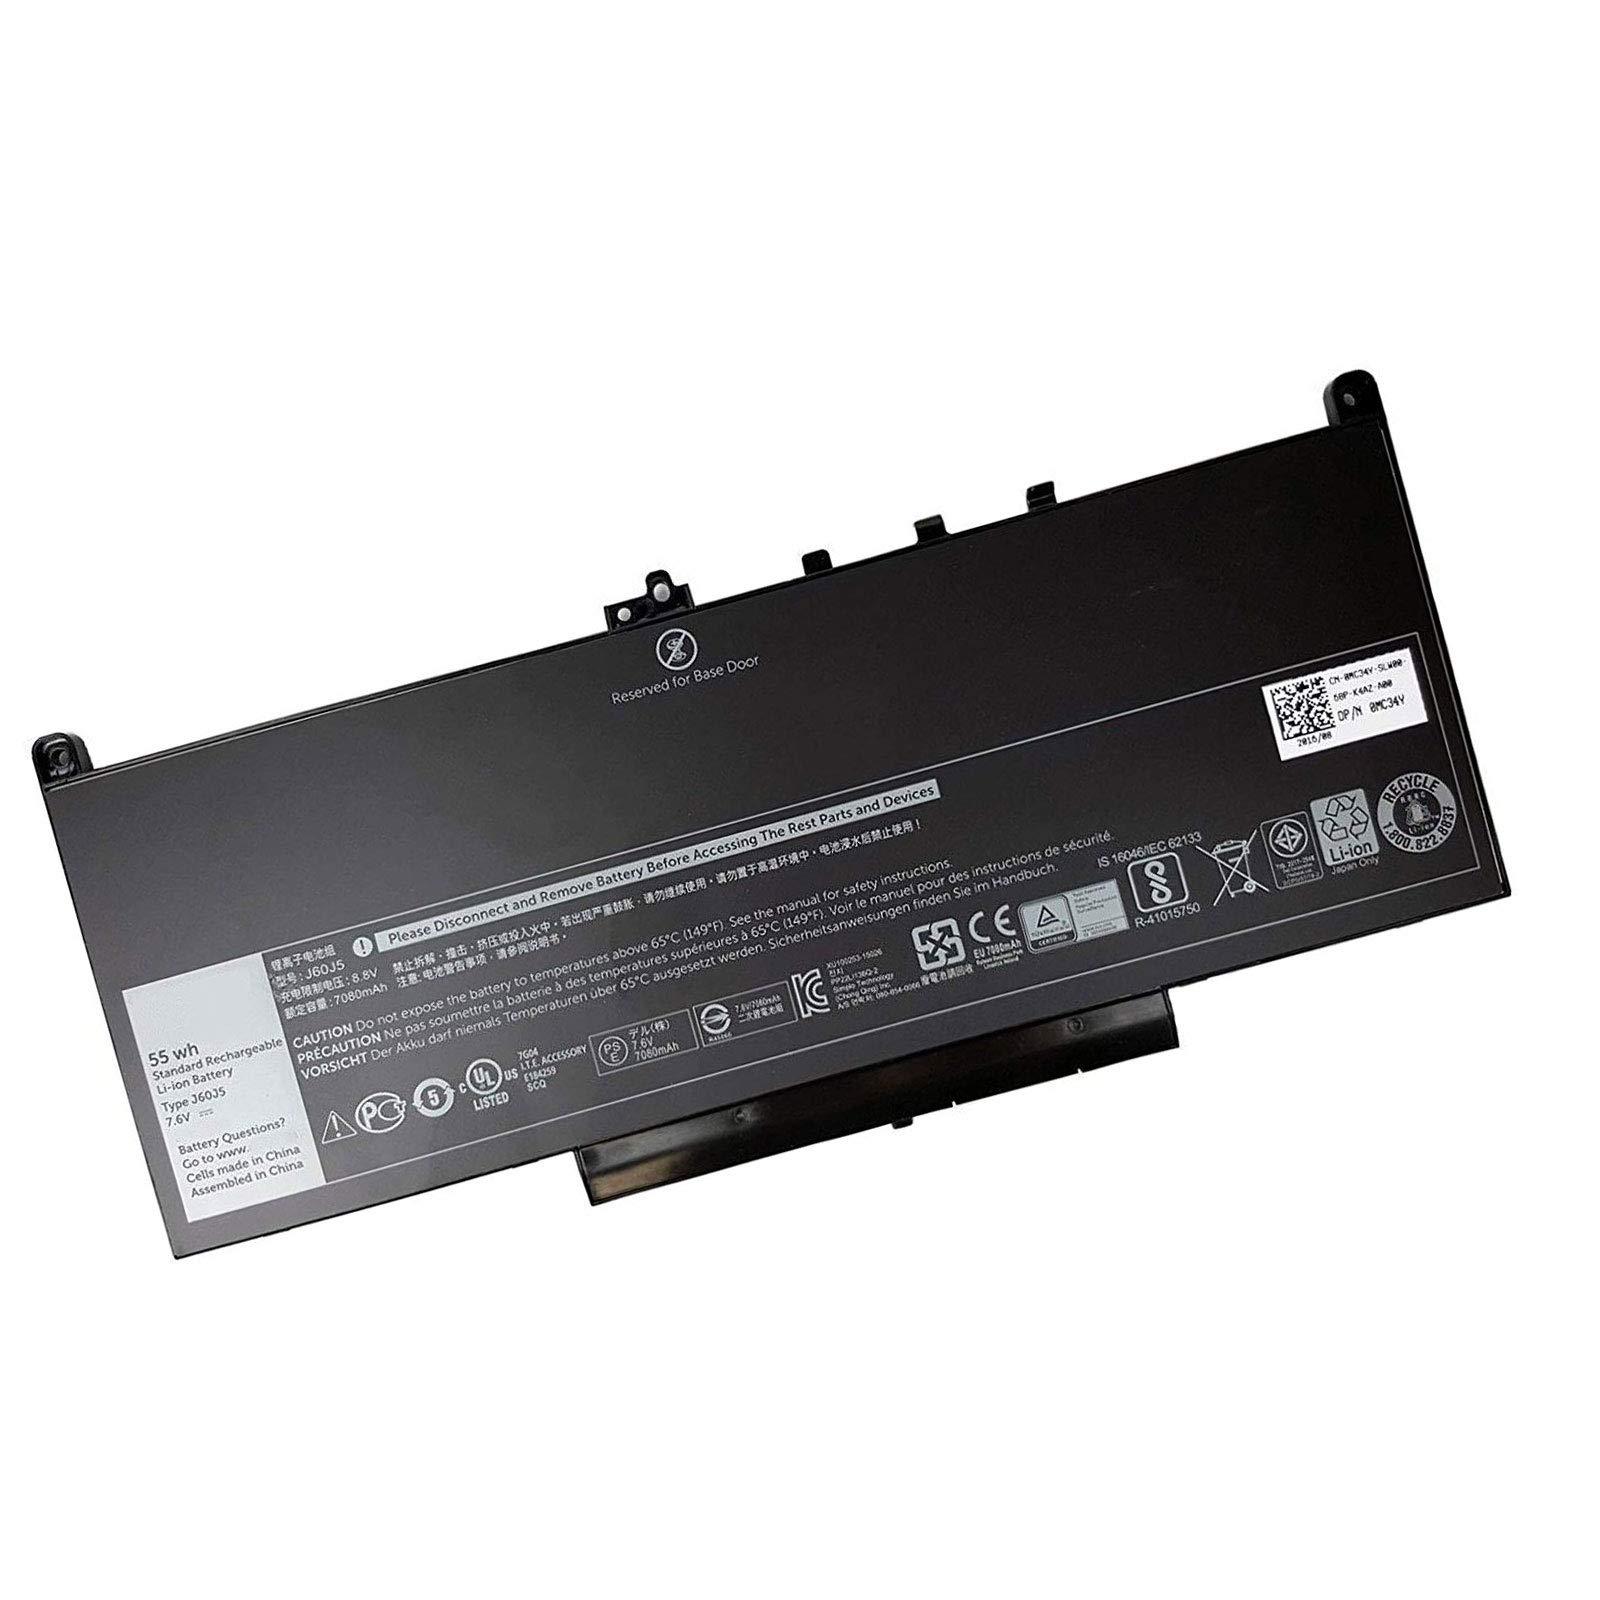 Dentsing J60J5 7.6V 55WH Laptop Battery Replacement for Dell Latitude E7270 E7470 Series R1V85 451-BBSX 451-BBSY 451-BBSU MC34Y 242WD